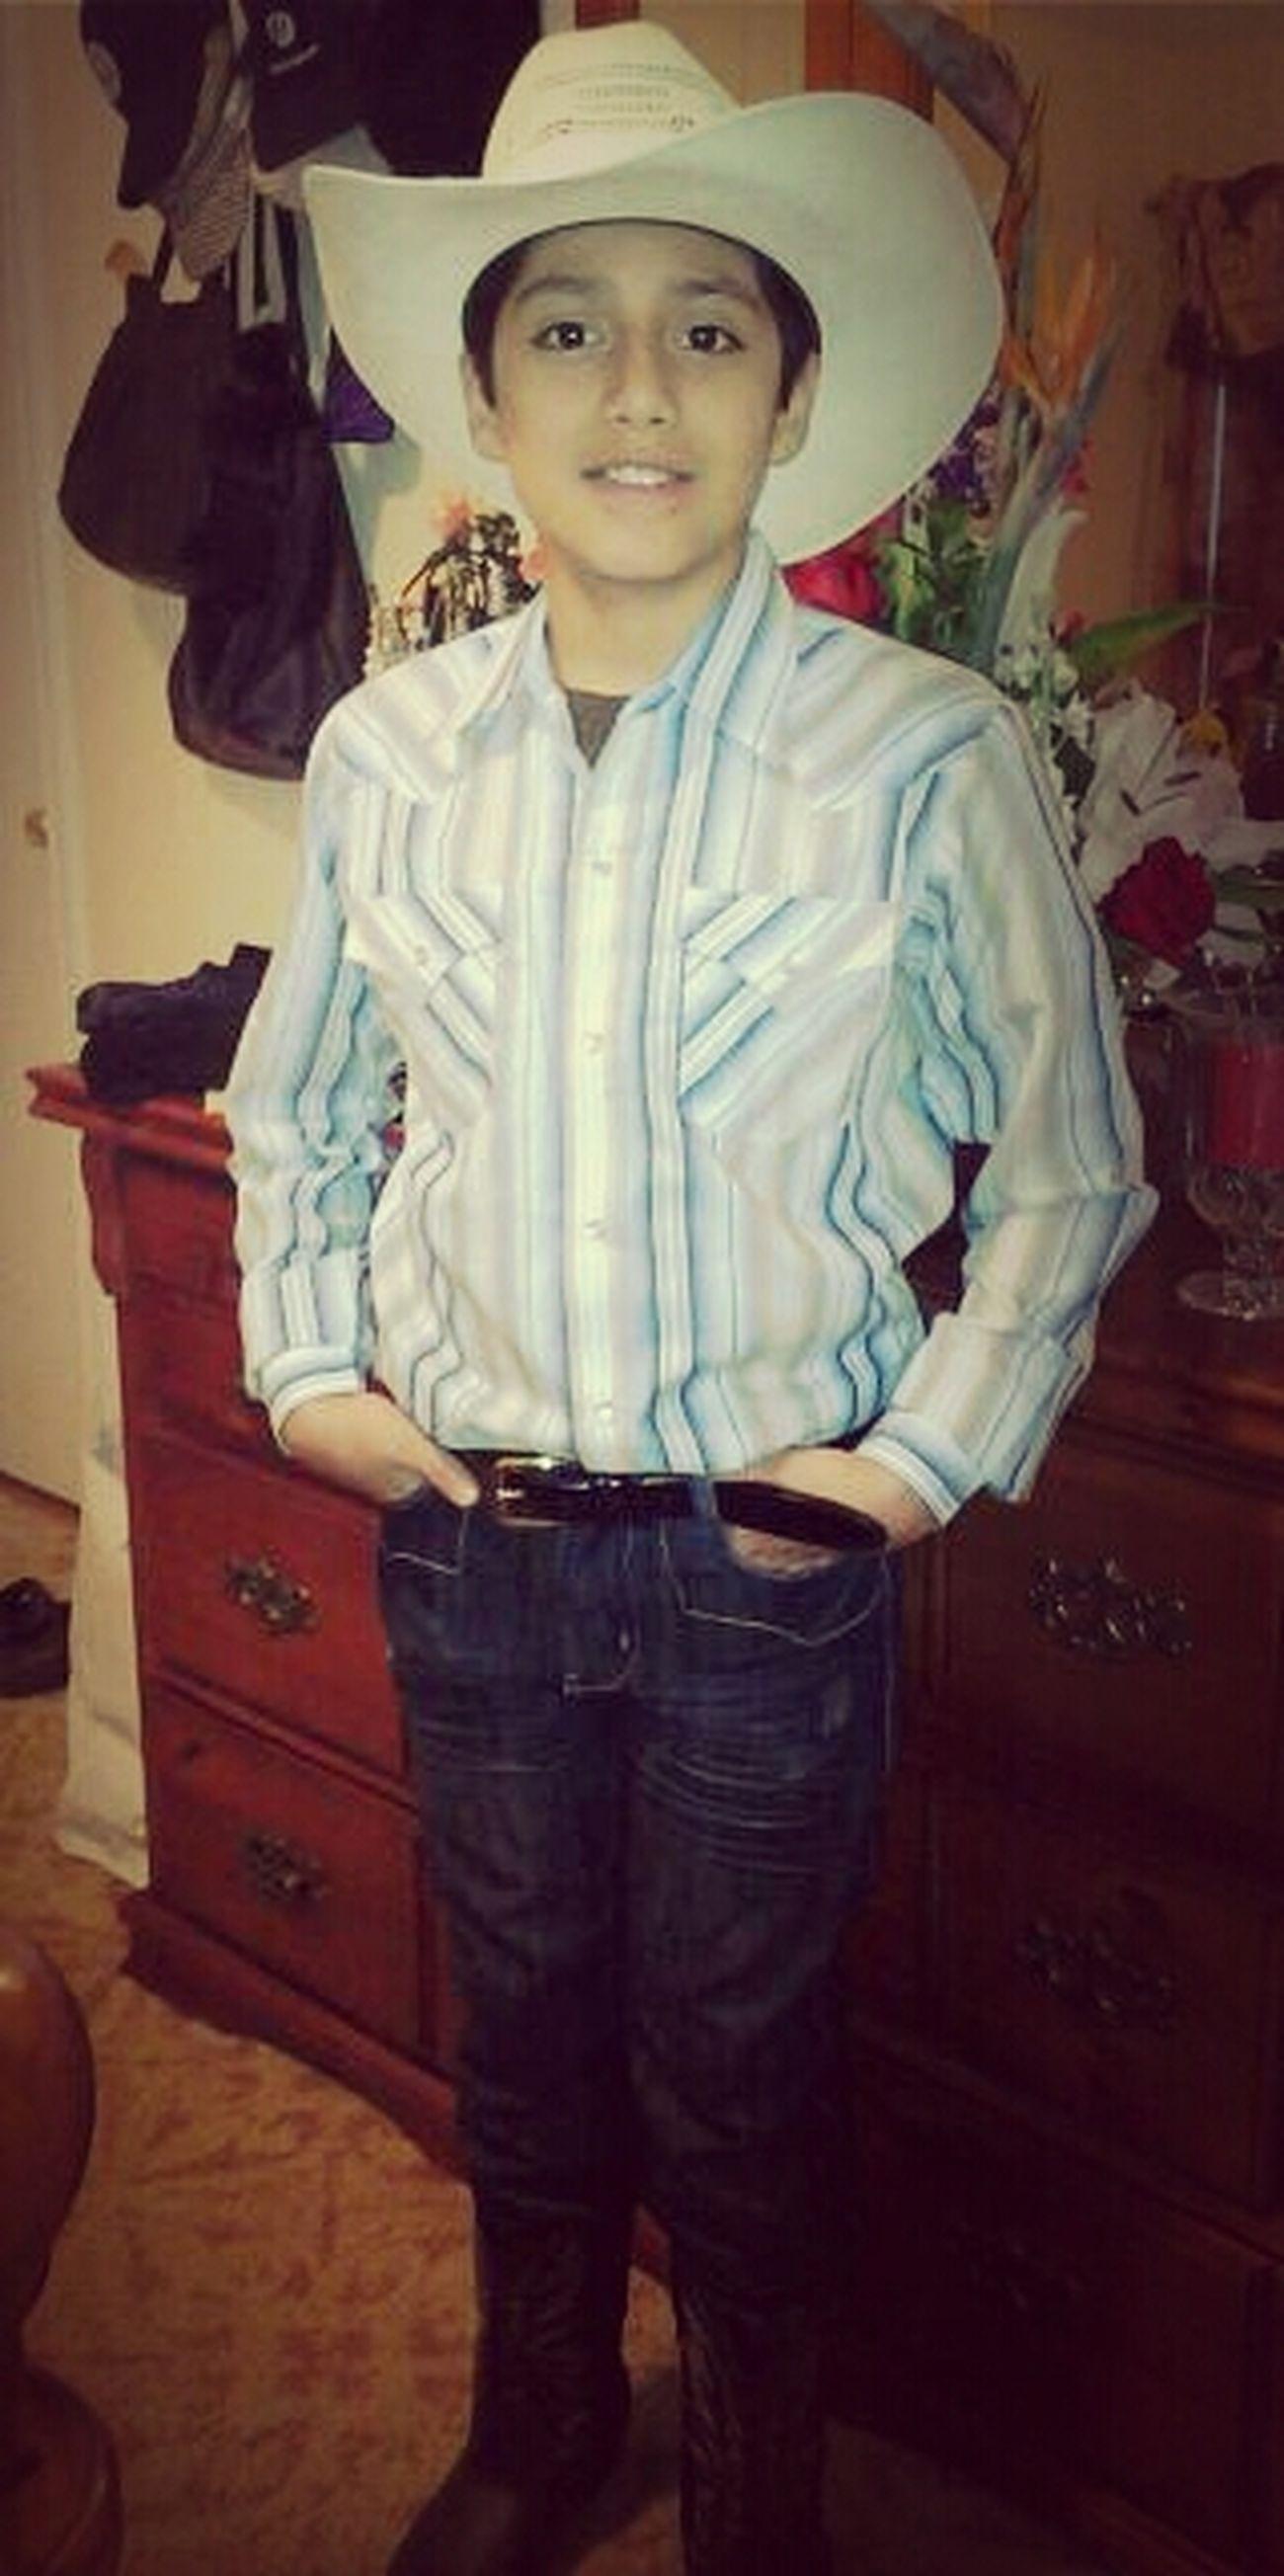 Cowboy Up! :)